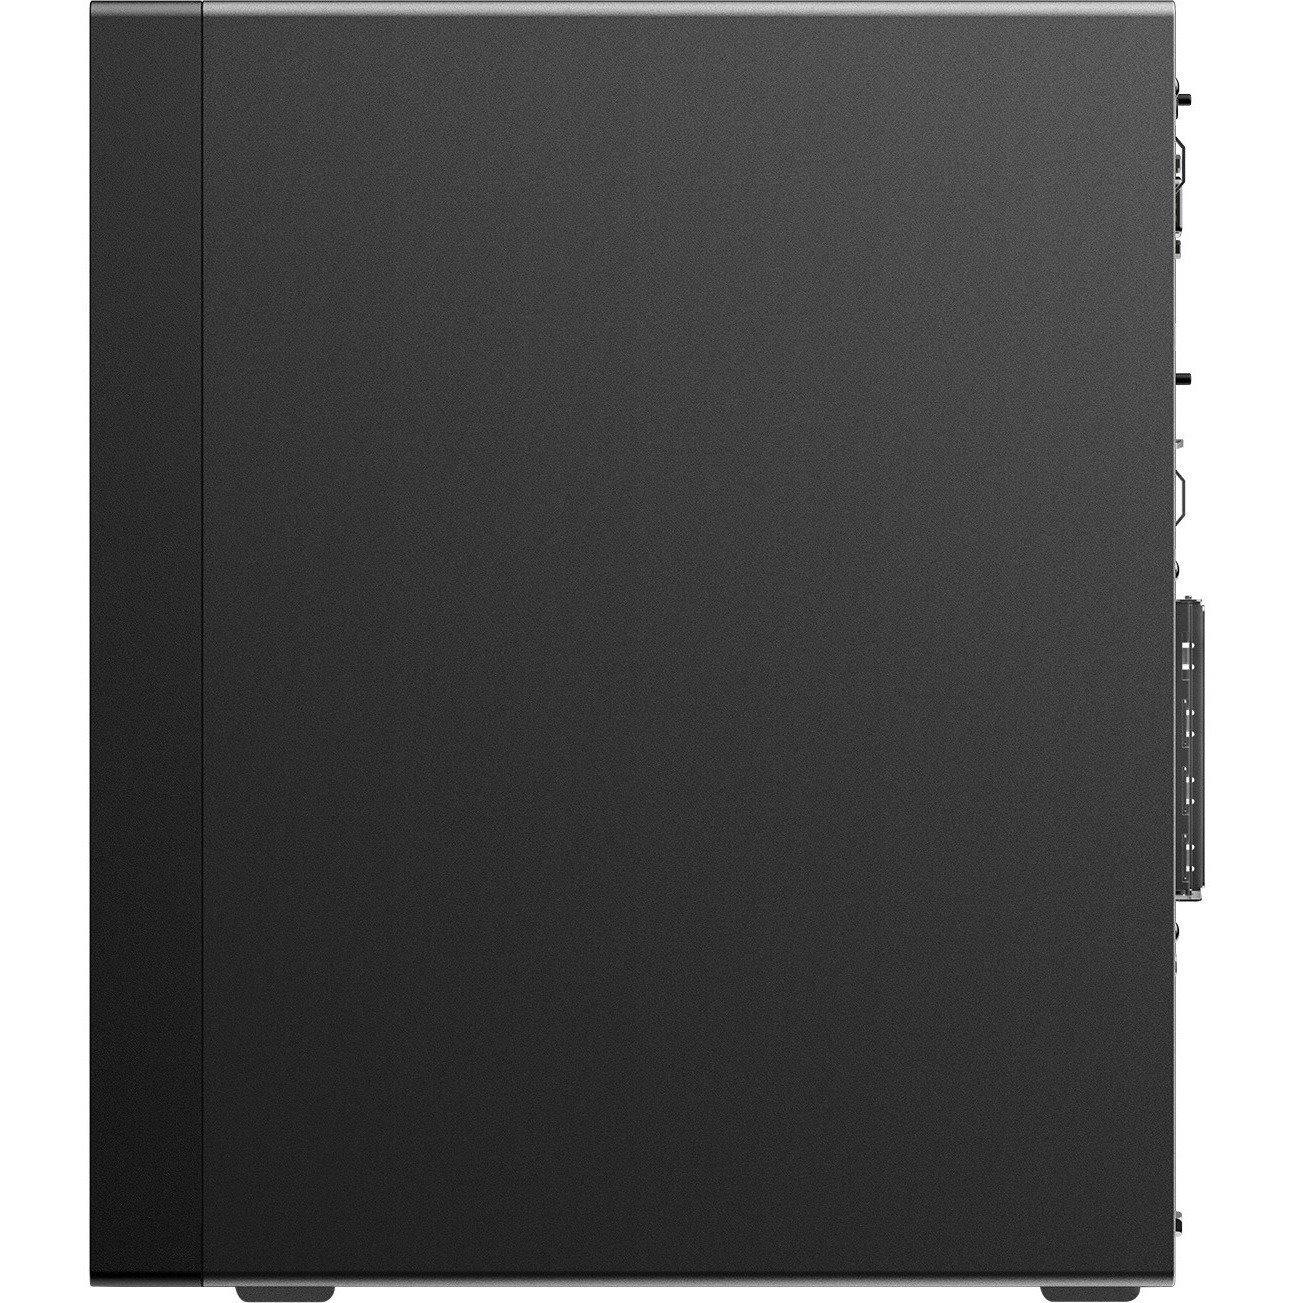 Lenovo ThinkStation P330 30C5S00N00 Workstation - 1 x Intel Xeon E-2124G 3.40 GHz - 16 GB DDR4 SDRAM - 512 GB SSD - NVIDIA Quadro P400 2 GB Graphics - Windows 10 Pro for Workstations 64-bit - Tower